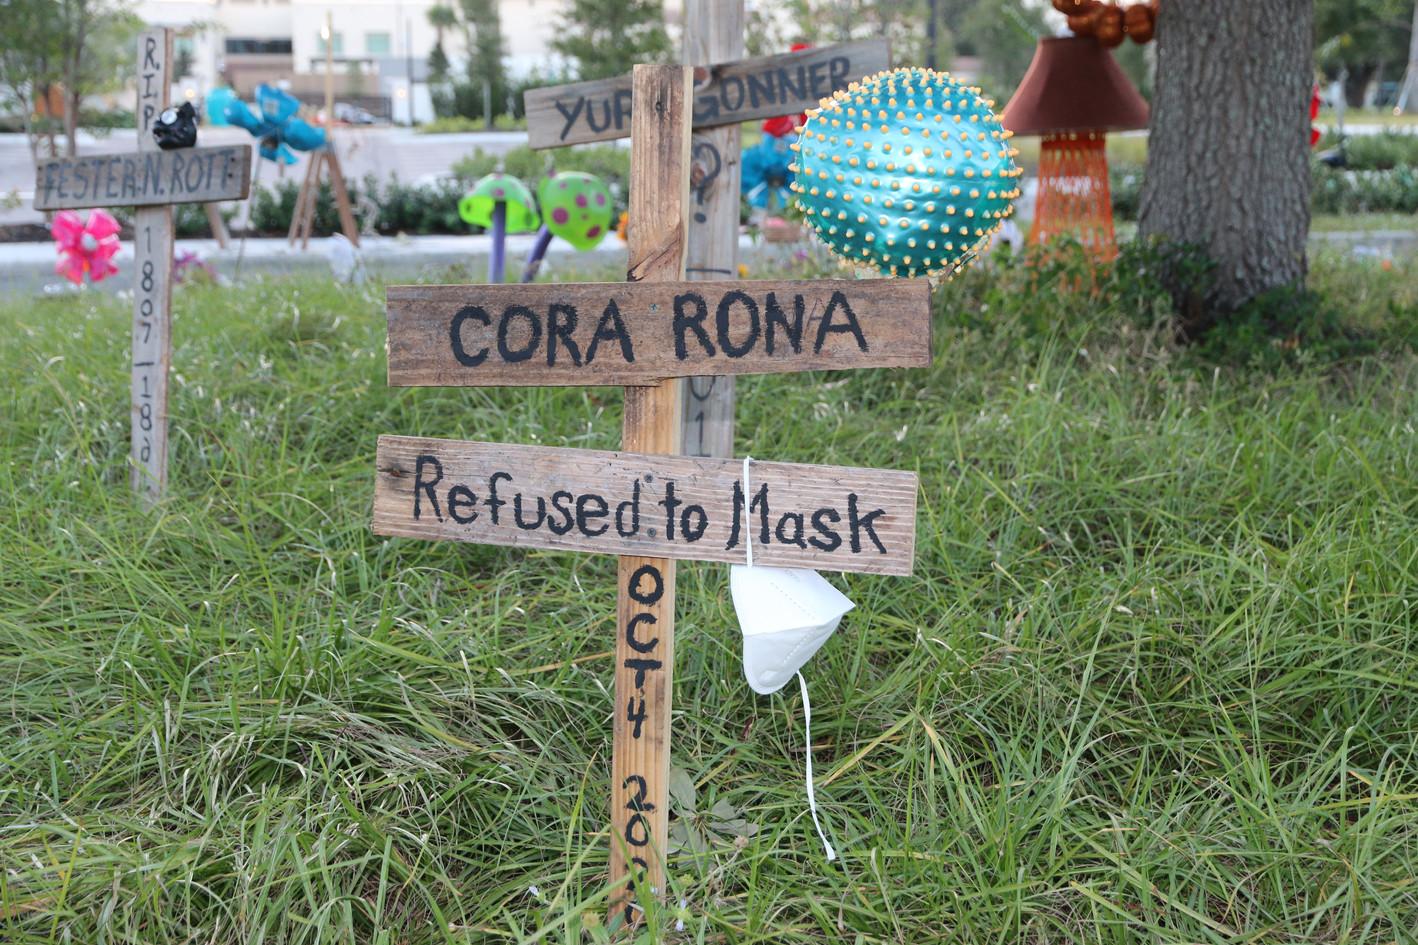 Cora Rona